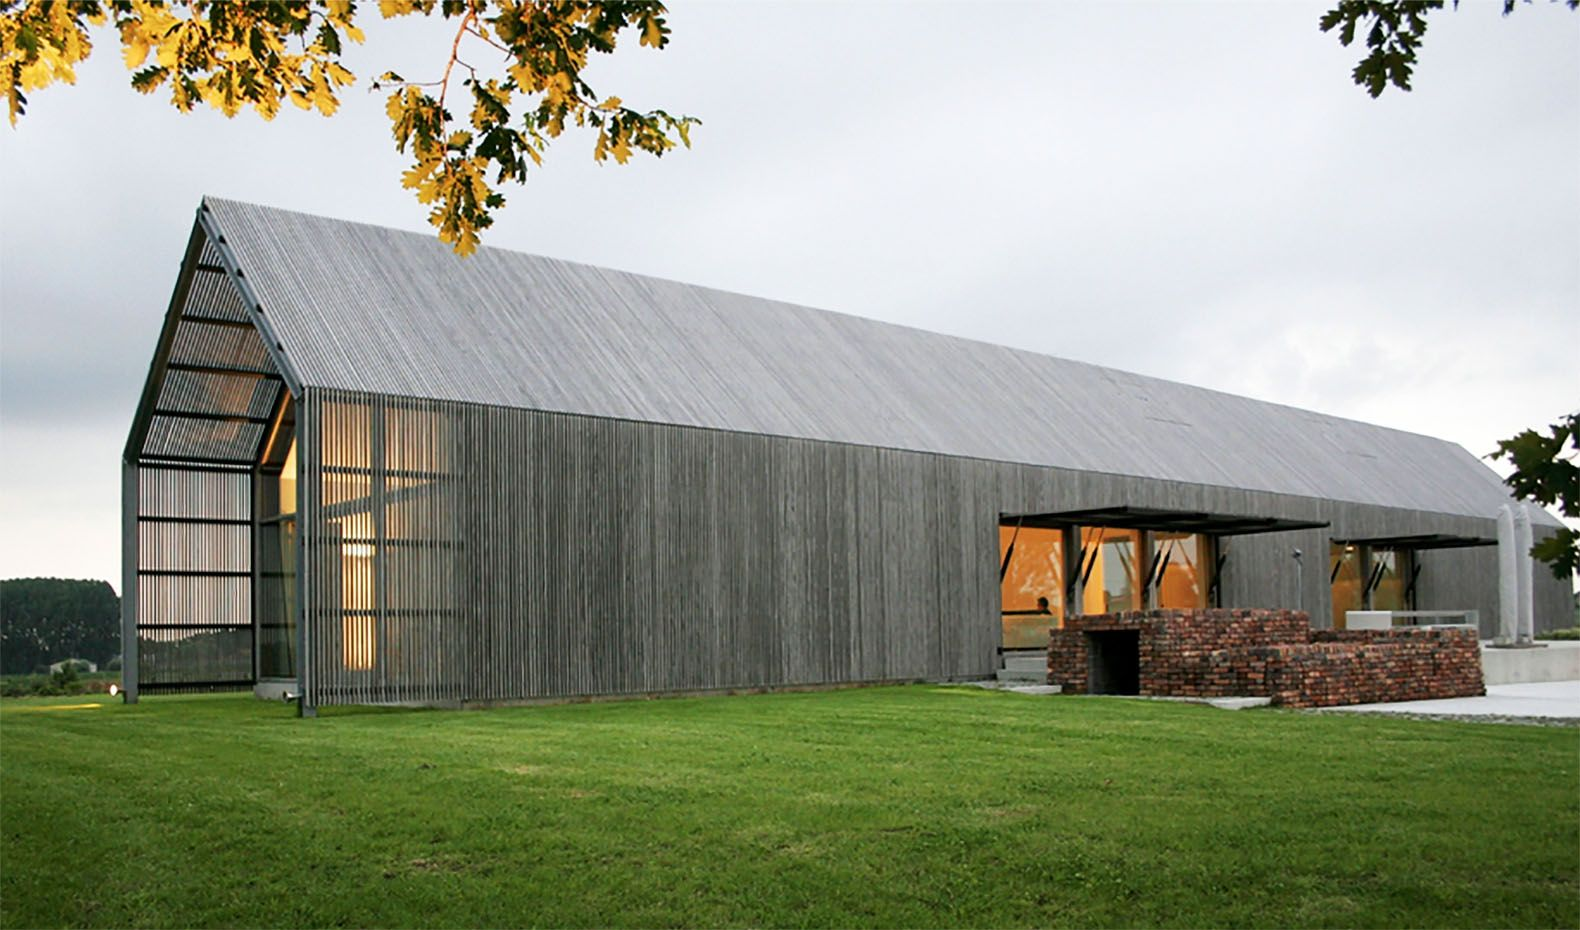 6 Barns Converted Into Beautiful New Homes Barn Style House Modern Barn House Facade House